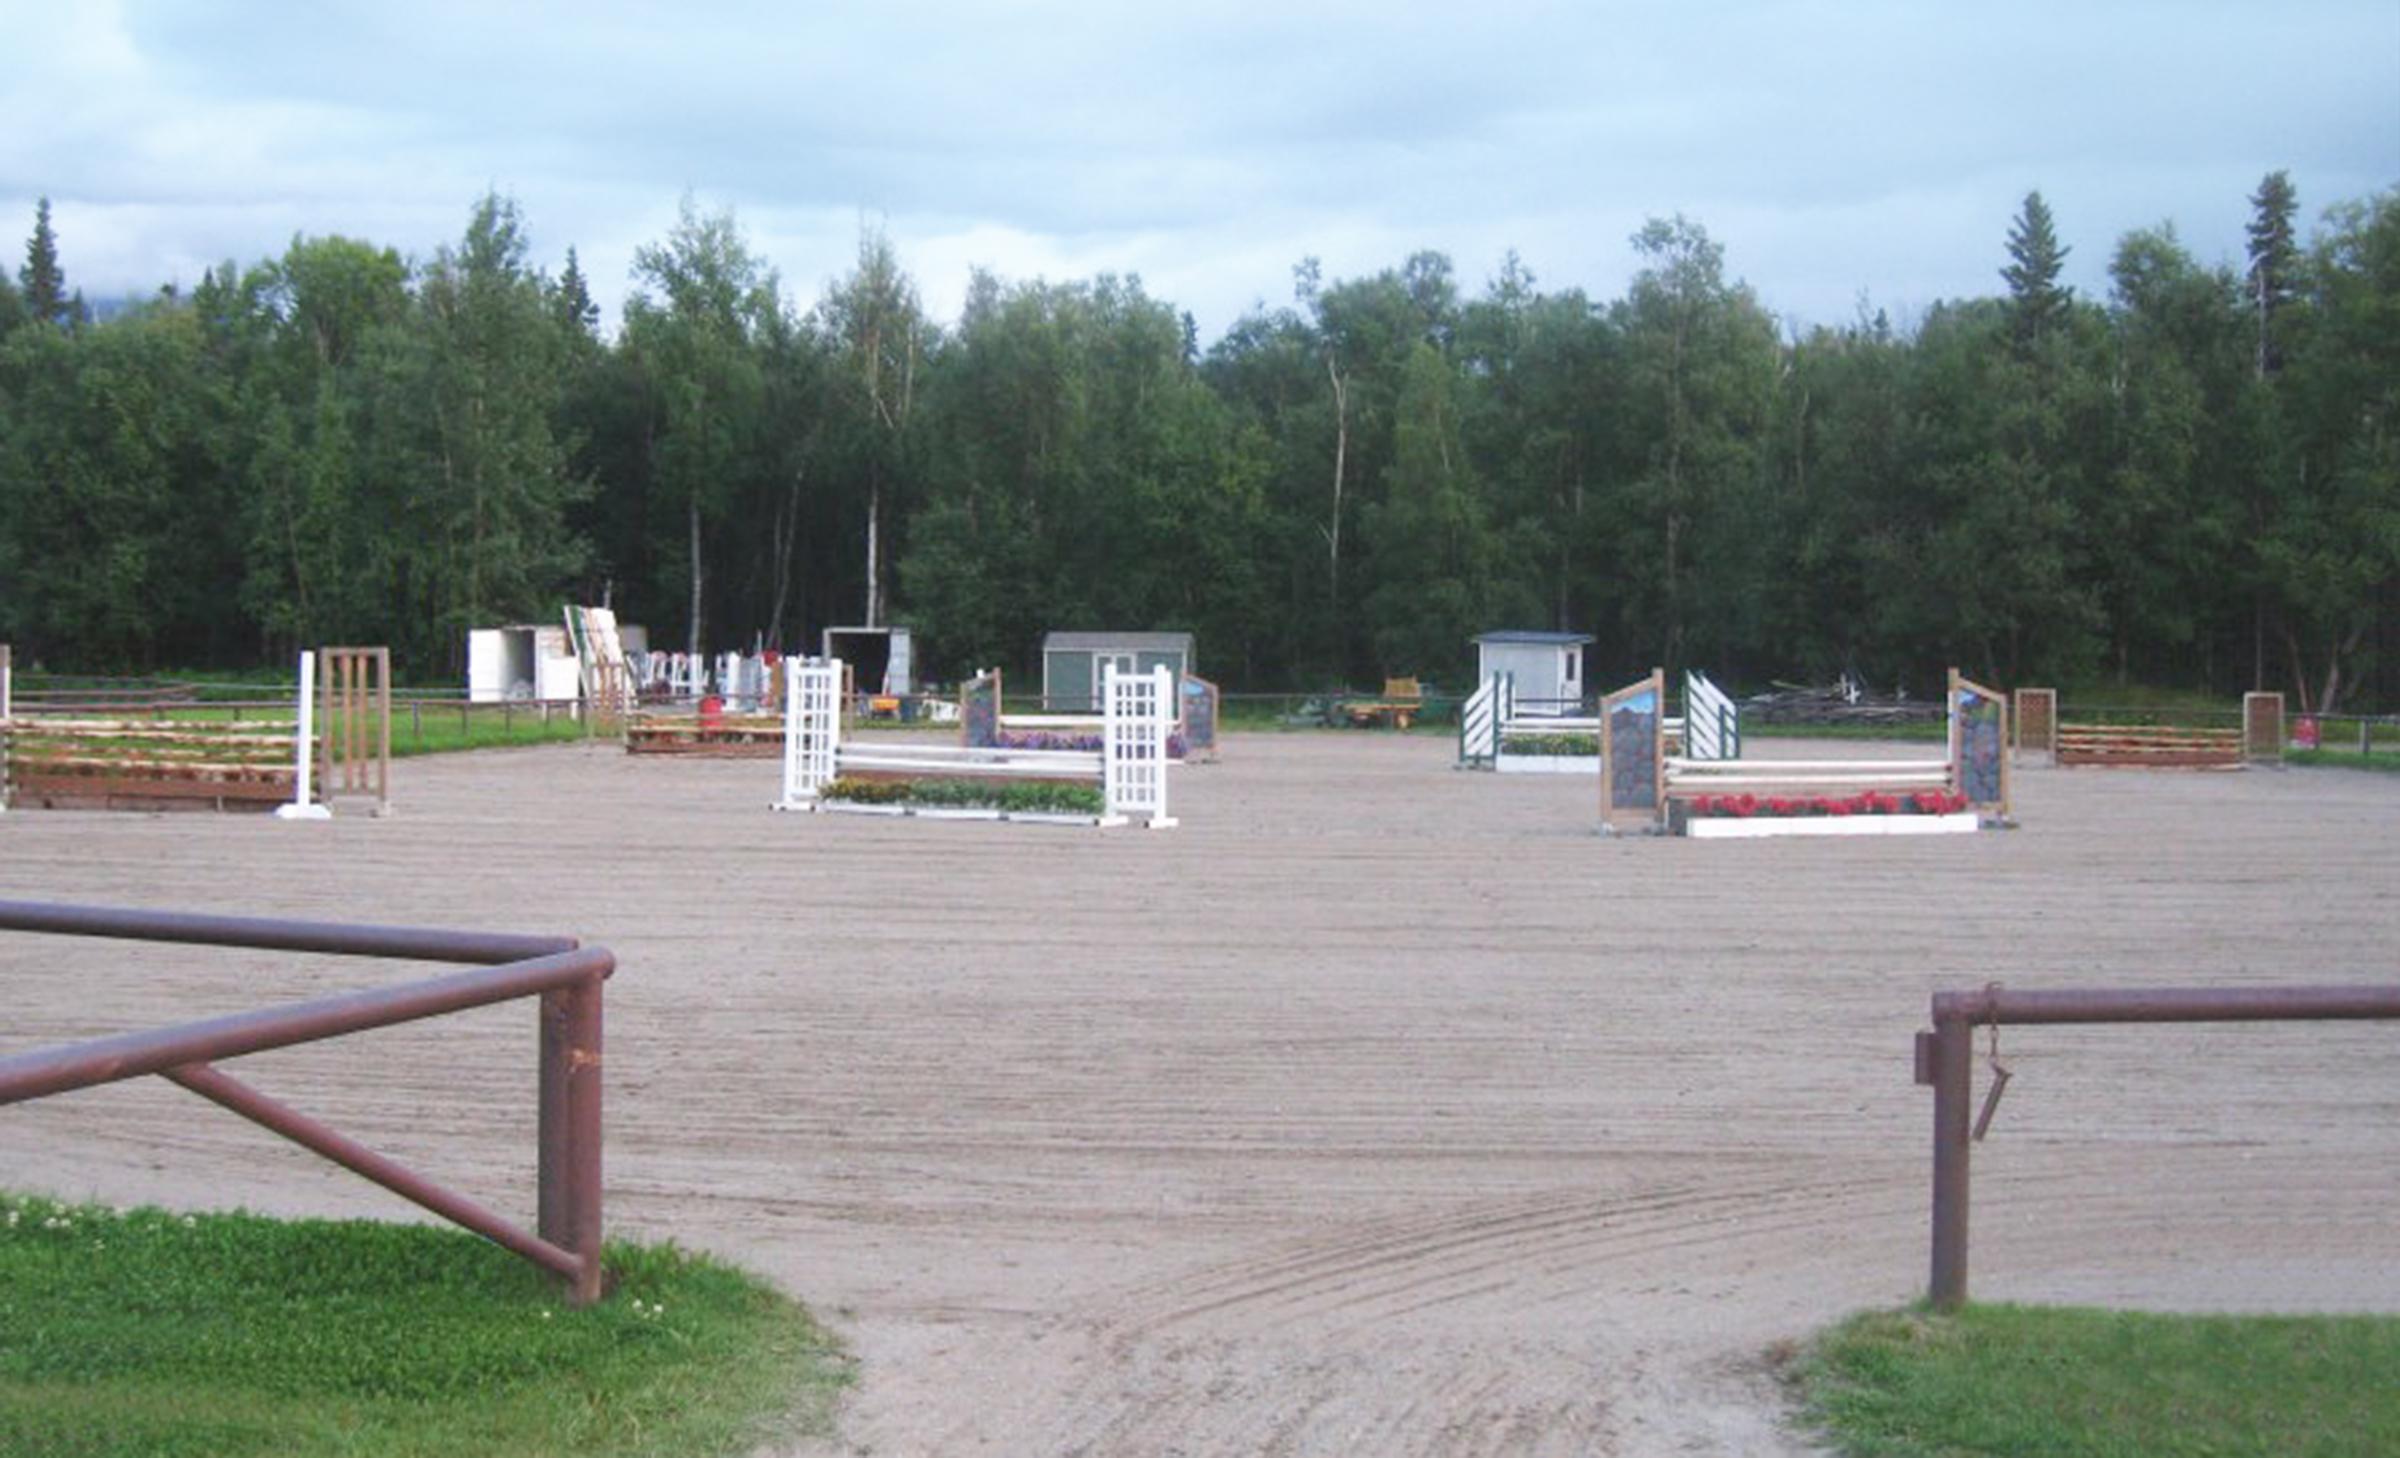 France Equestrian Center Alaska State Fair